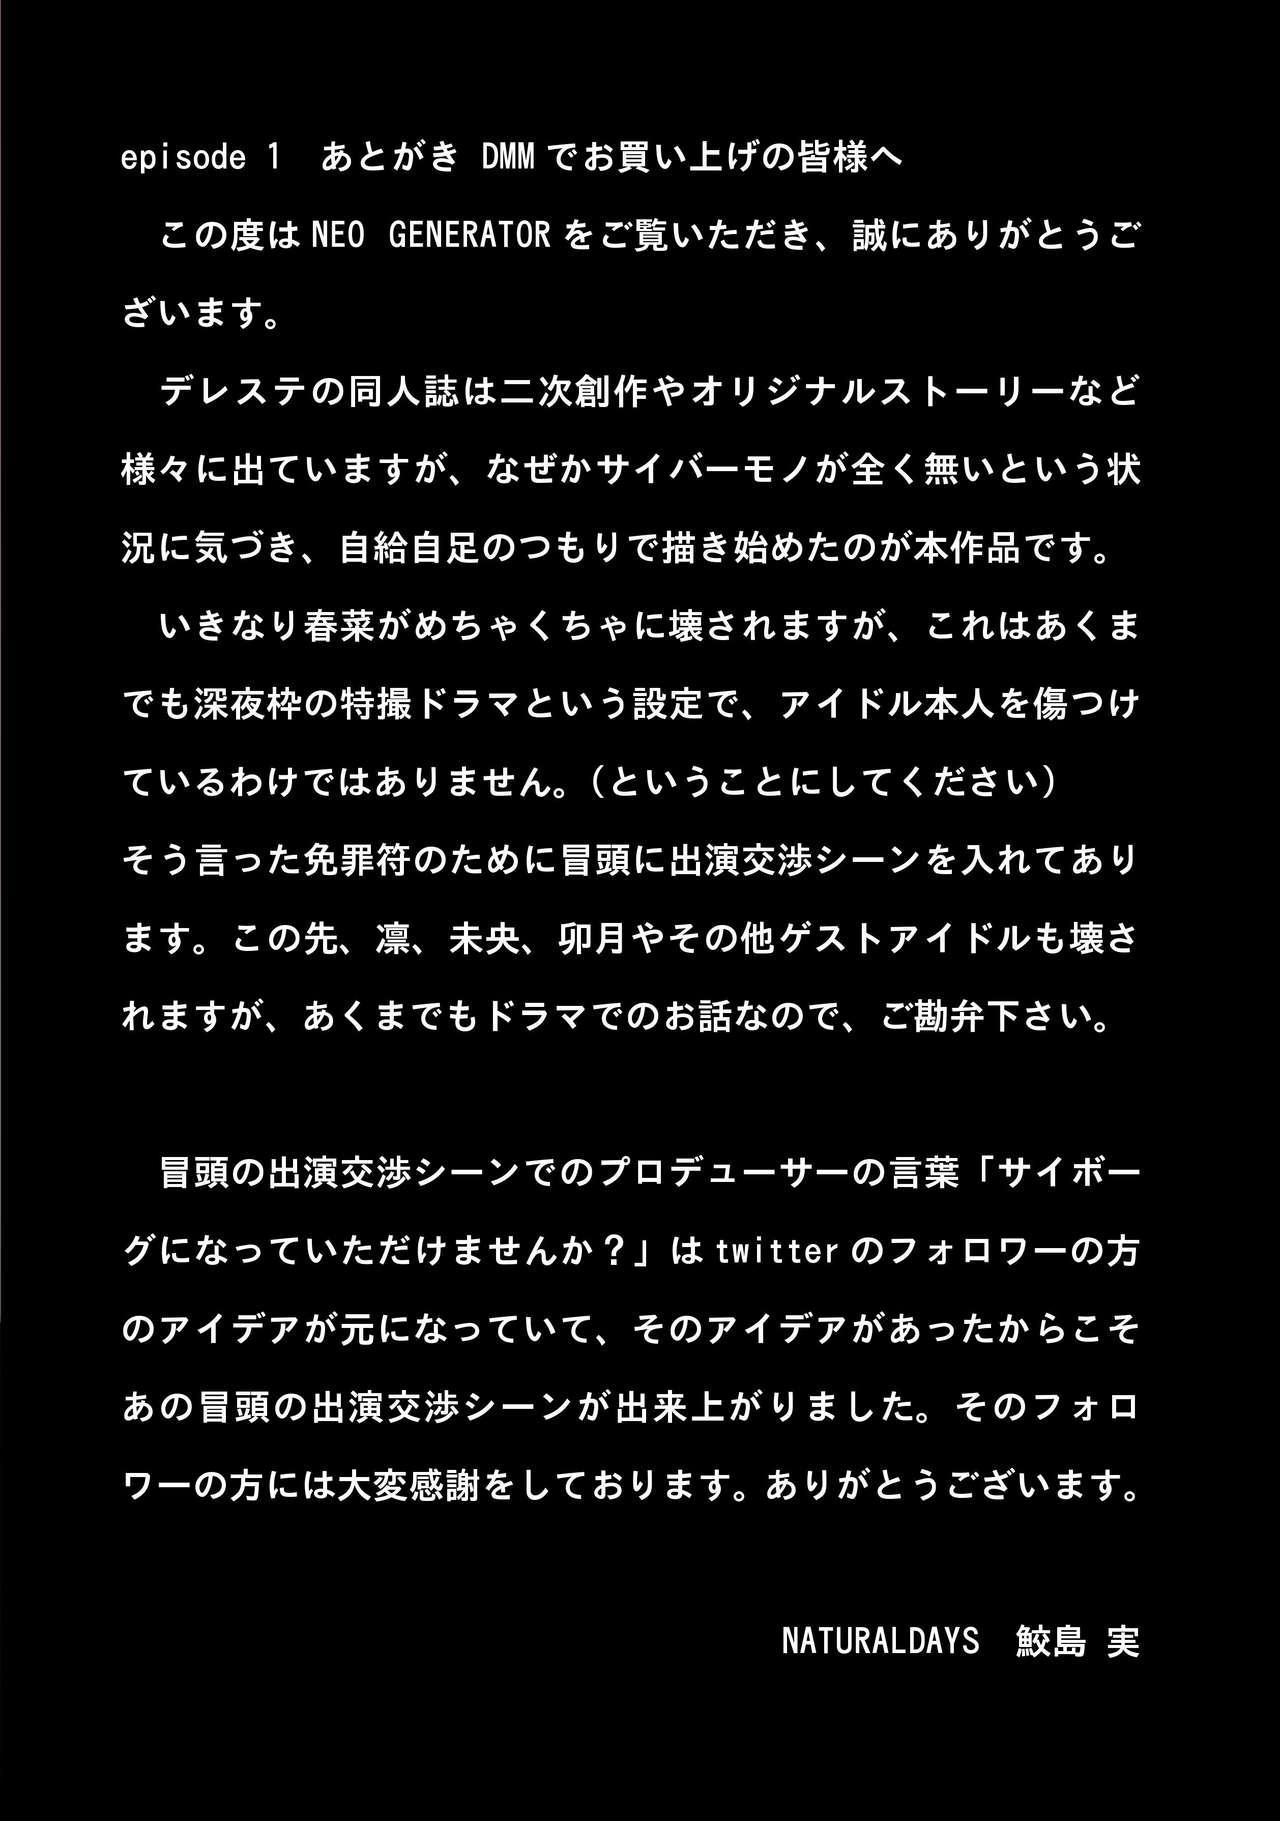 Idol Cyber Senki NEO GENERATOR episode 1 Shutsugeki! Neo Generator 75